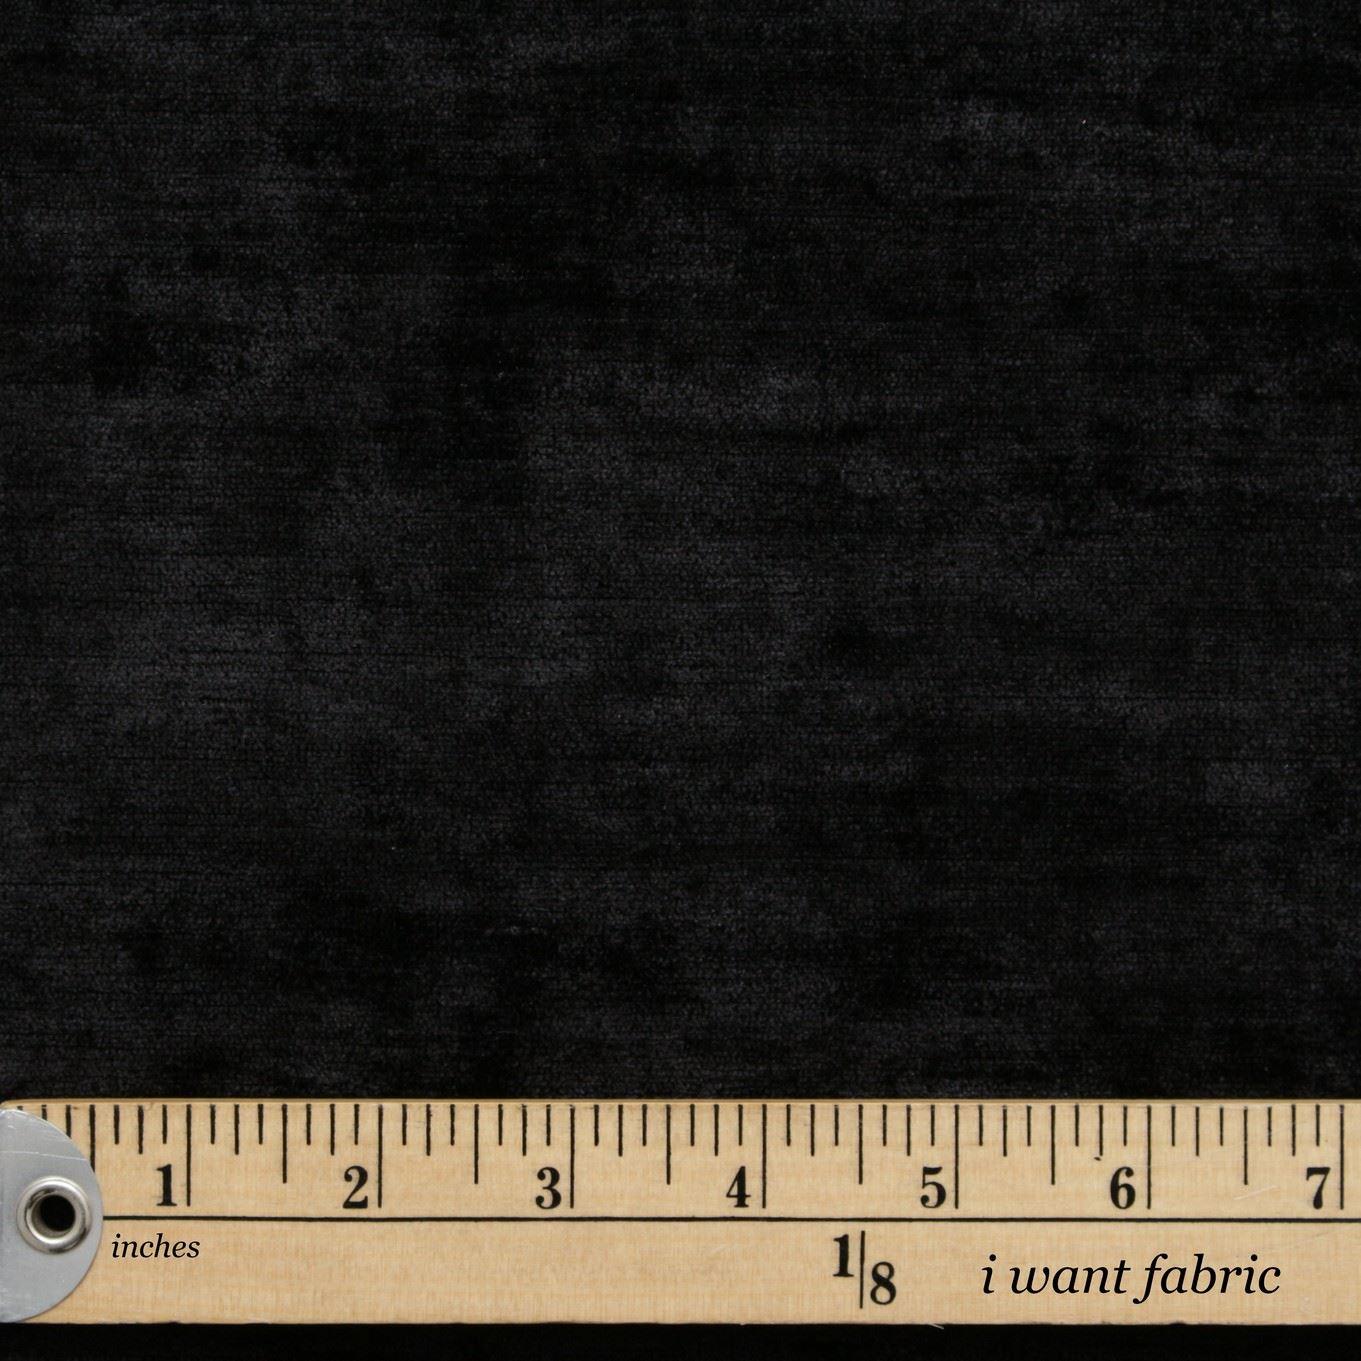 thumbnail 8 - LUXURY PLUSH CRUSHED SATIN VELVET SUPER SOFT HEAVY WEIGHT UPHOLSTERY FABRIC